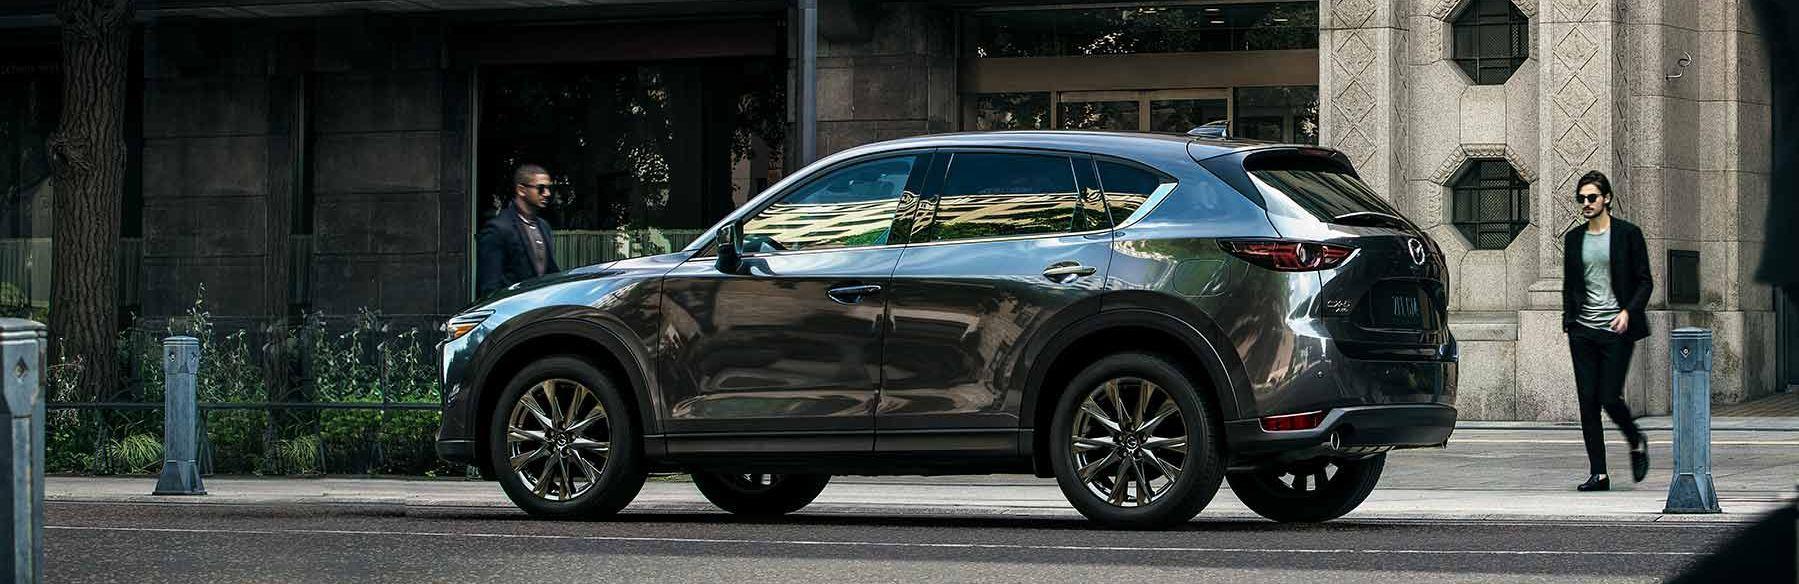 2019 Mazda CX-5 Financing near Roseville, CA